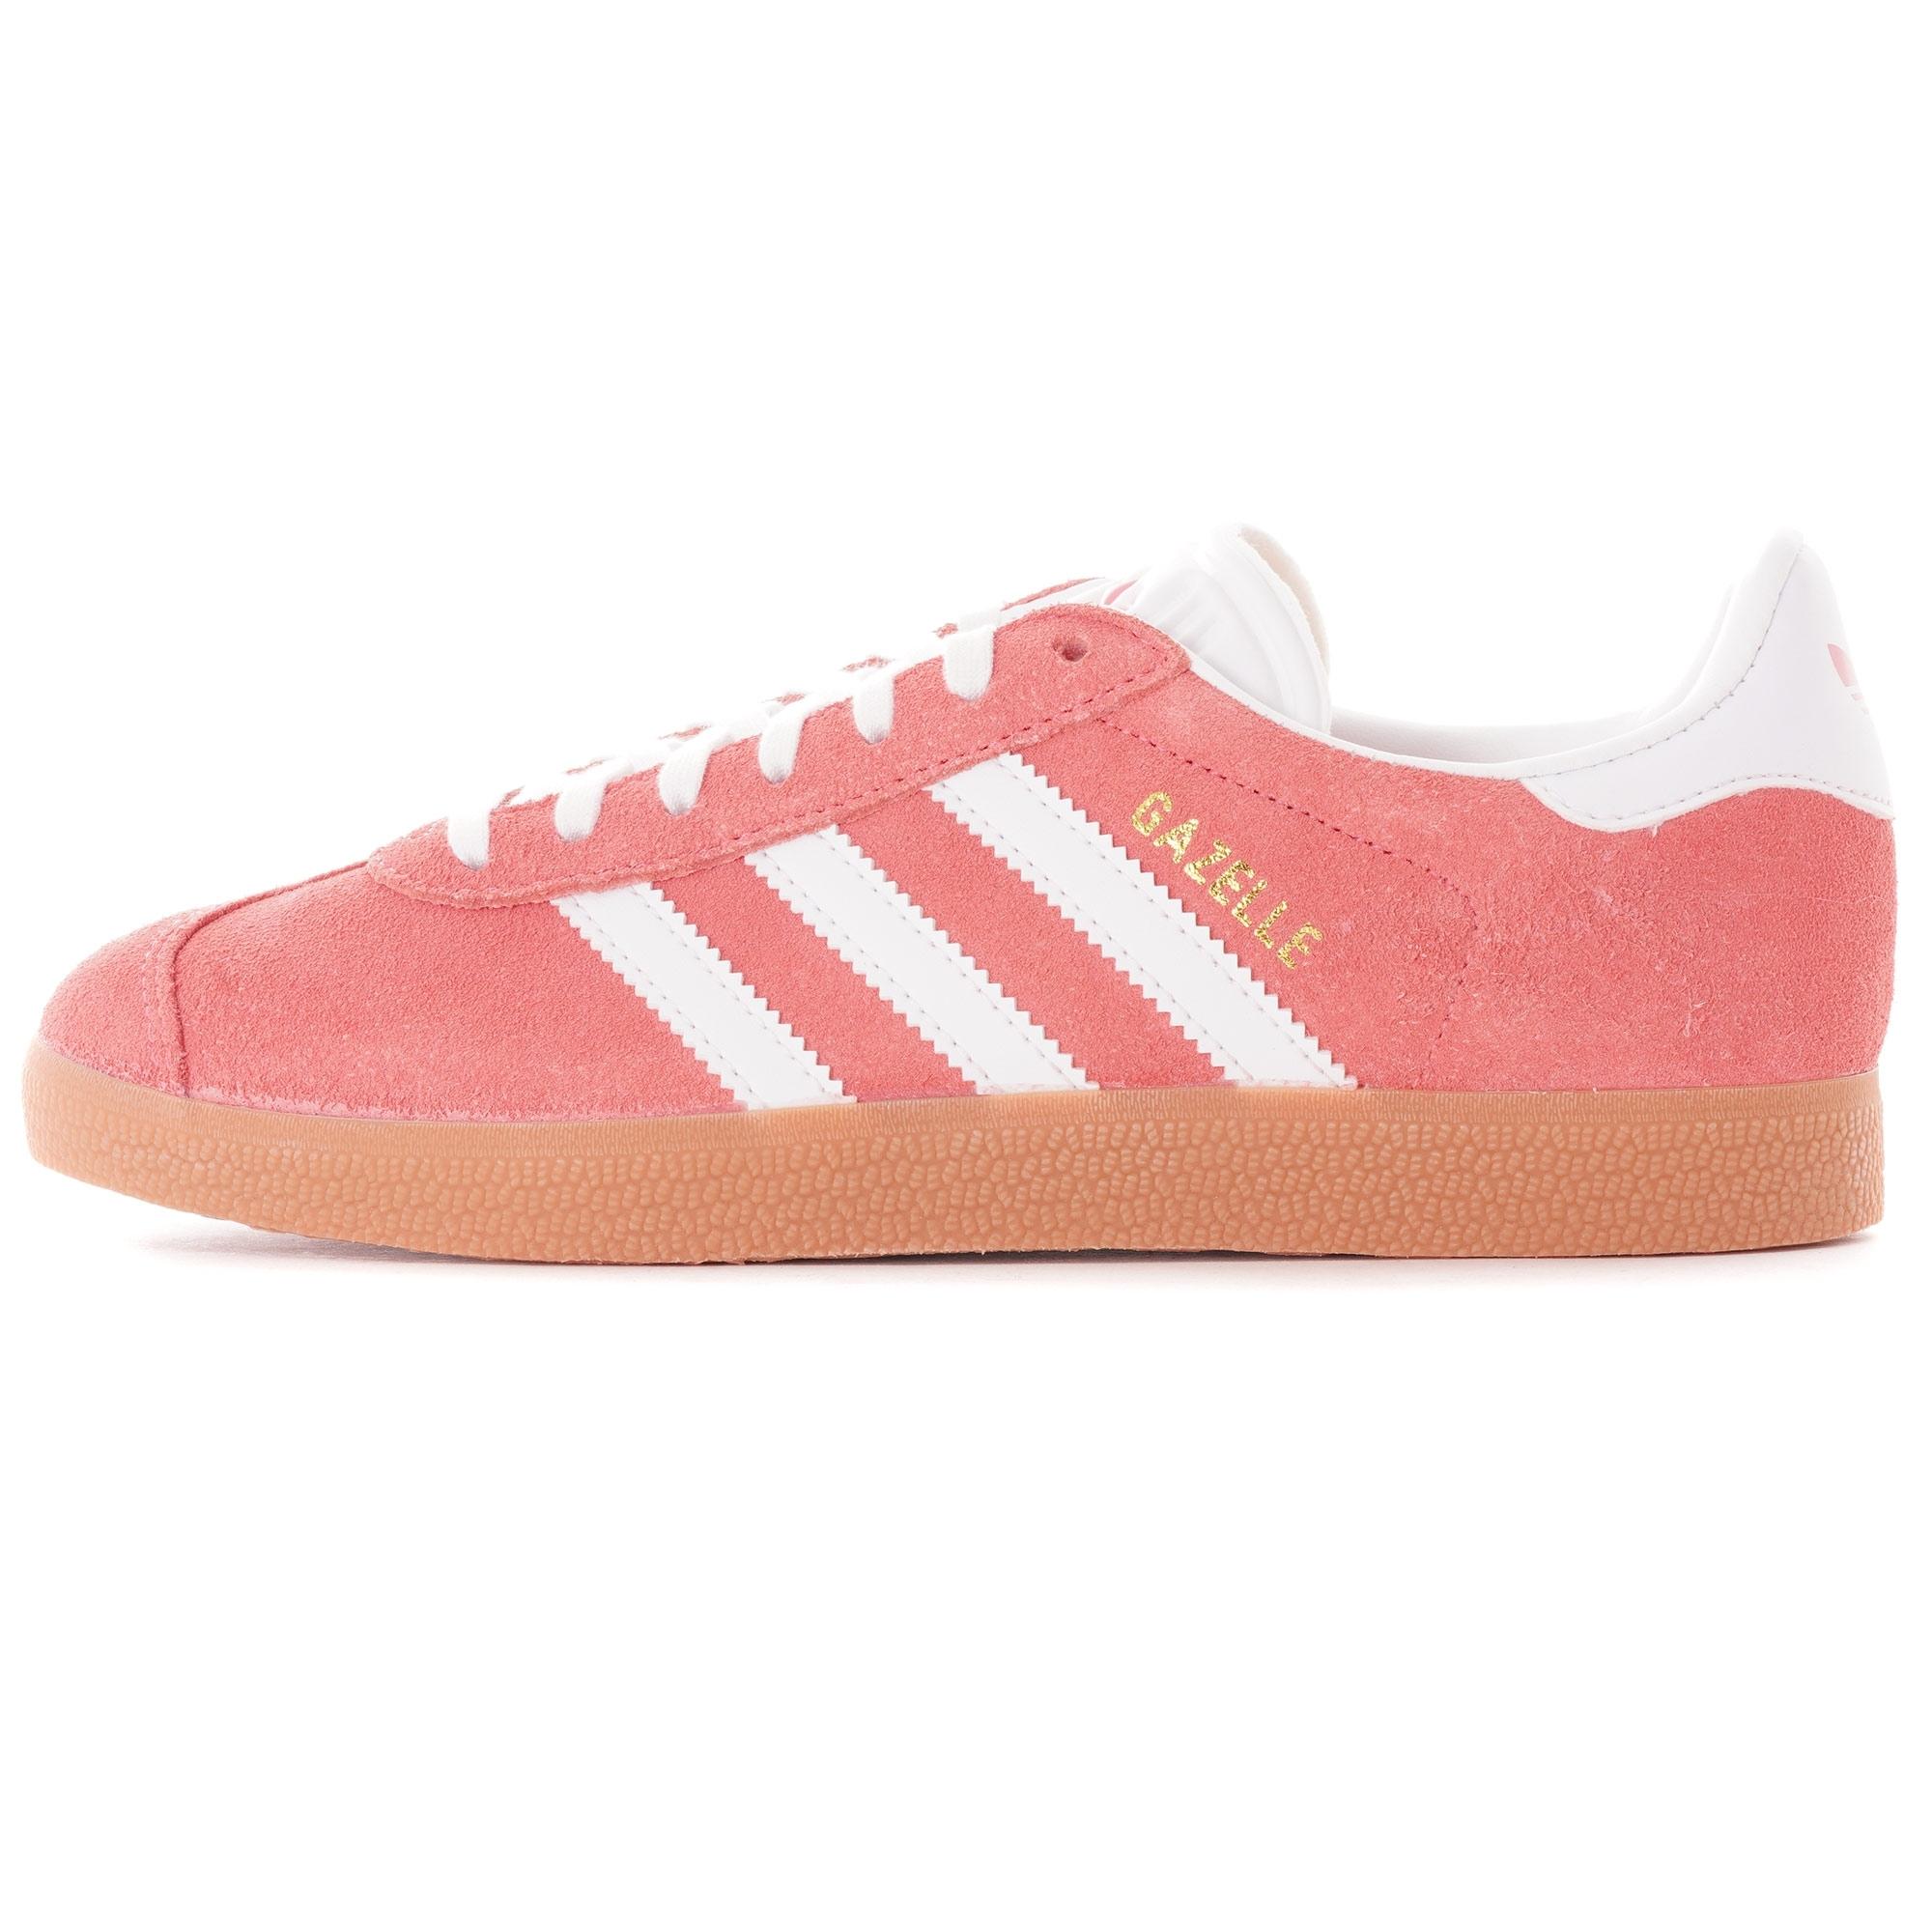 Adidas Originals Womens Gazelle - Pink